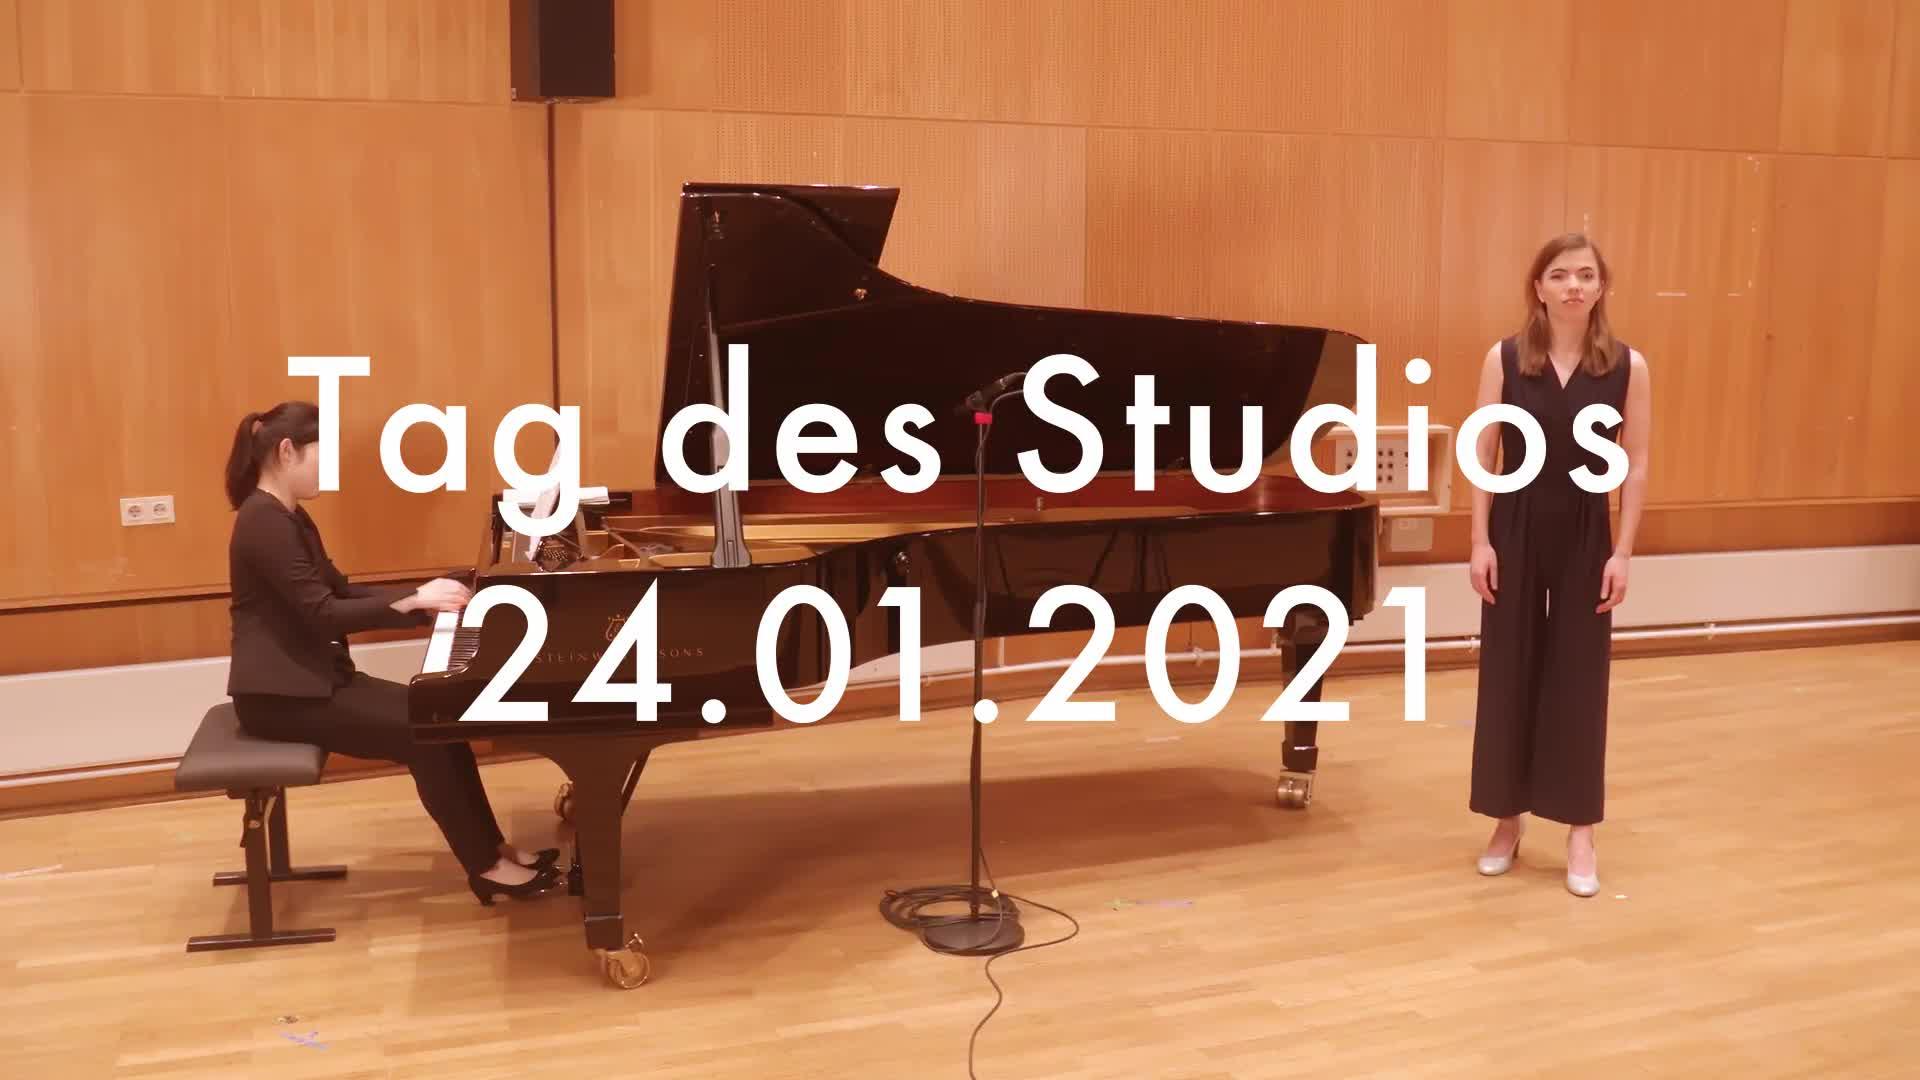 Thumbnail - Tag des Studios - Studiokonzerte und verwandte Formate